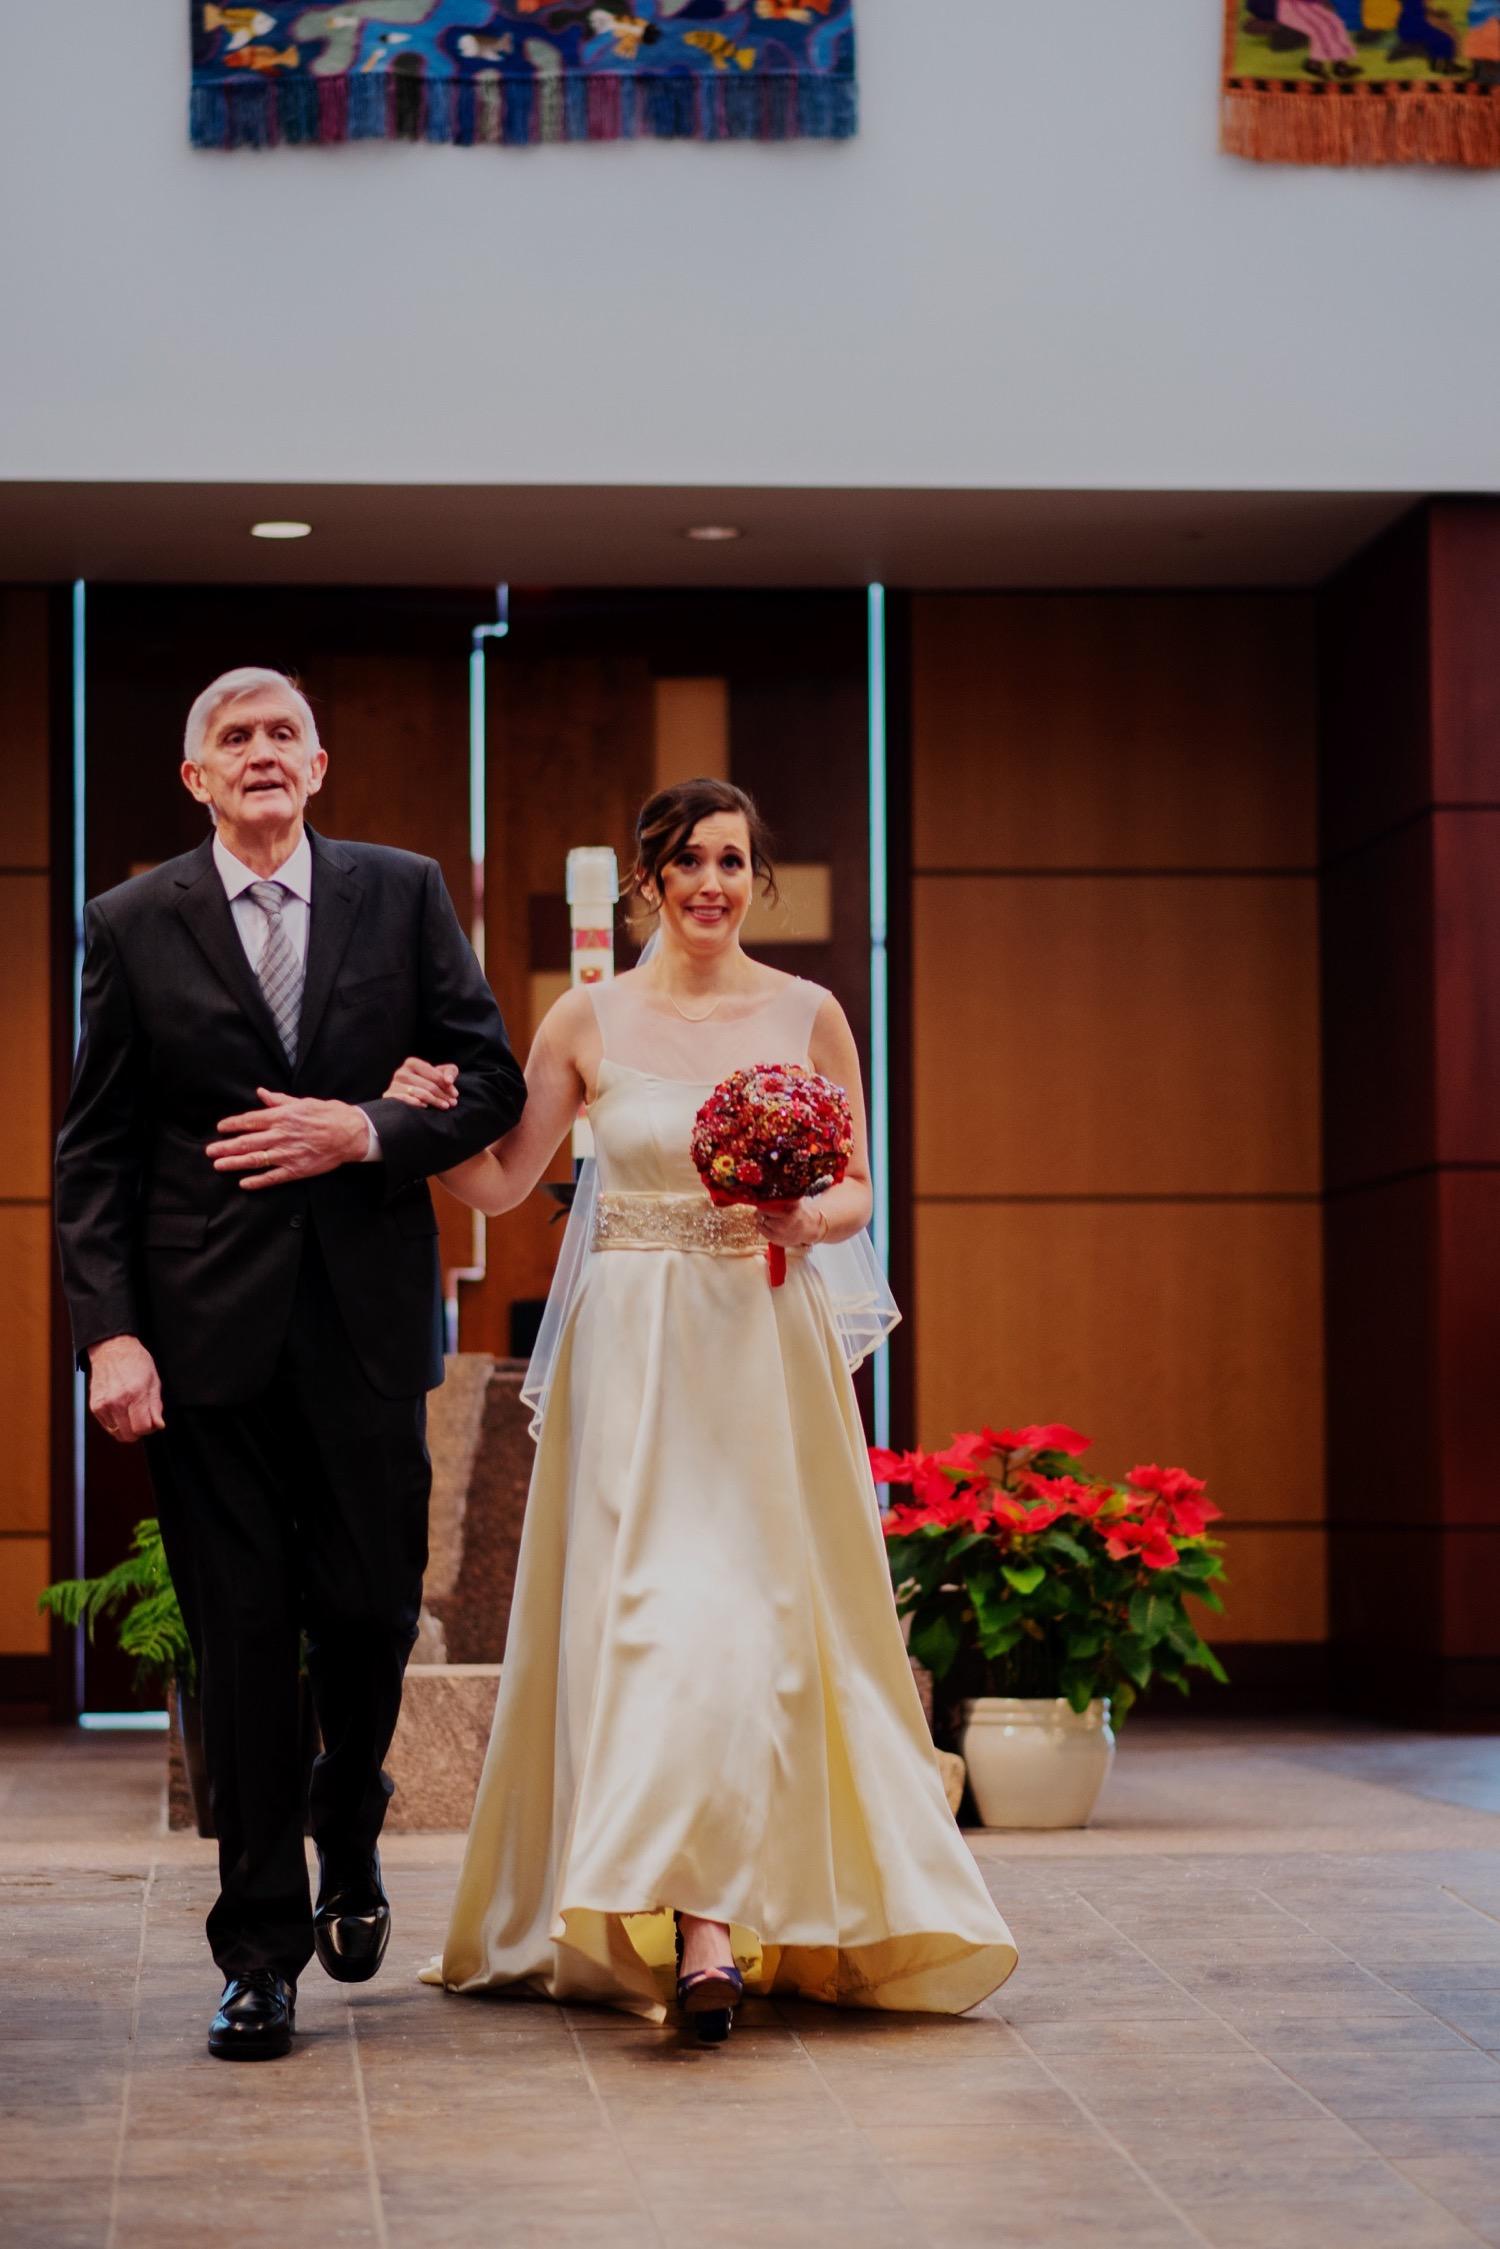 043_McGrath-Libertyville-IndependenceGrove-Winter-Wedding_0062_Independencegrovewedding.jpg